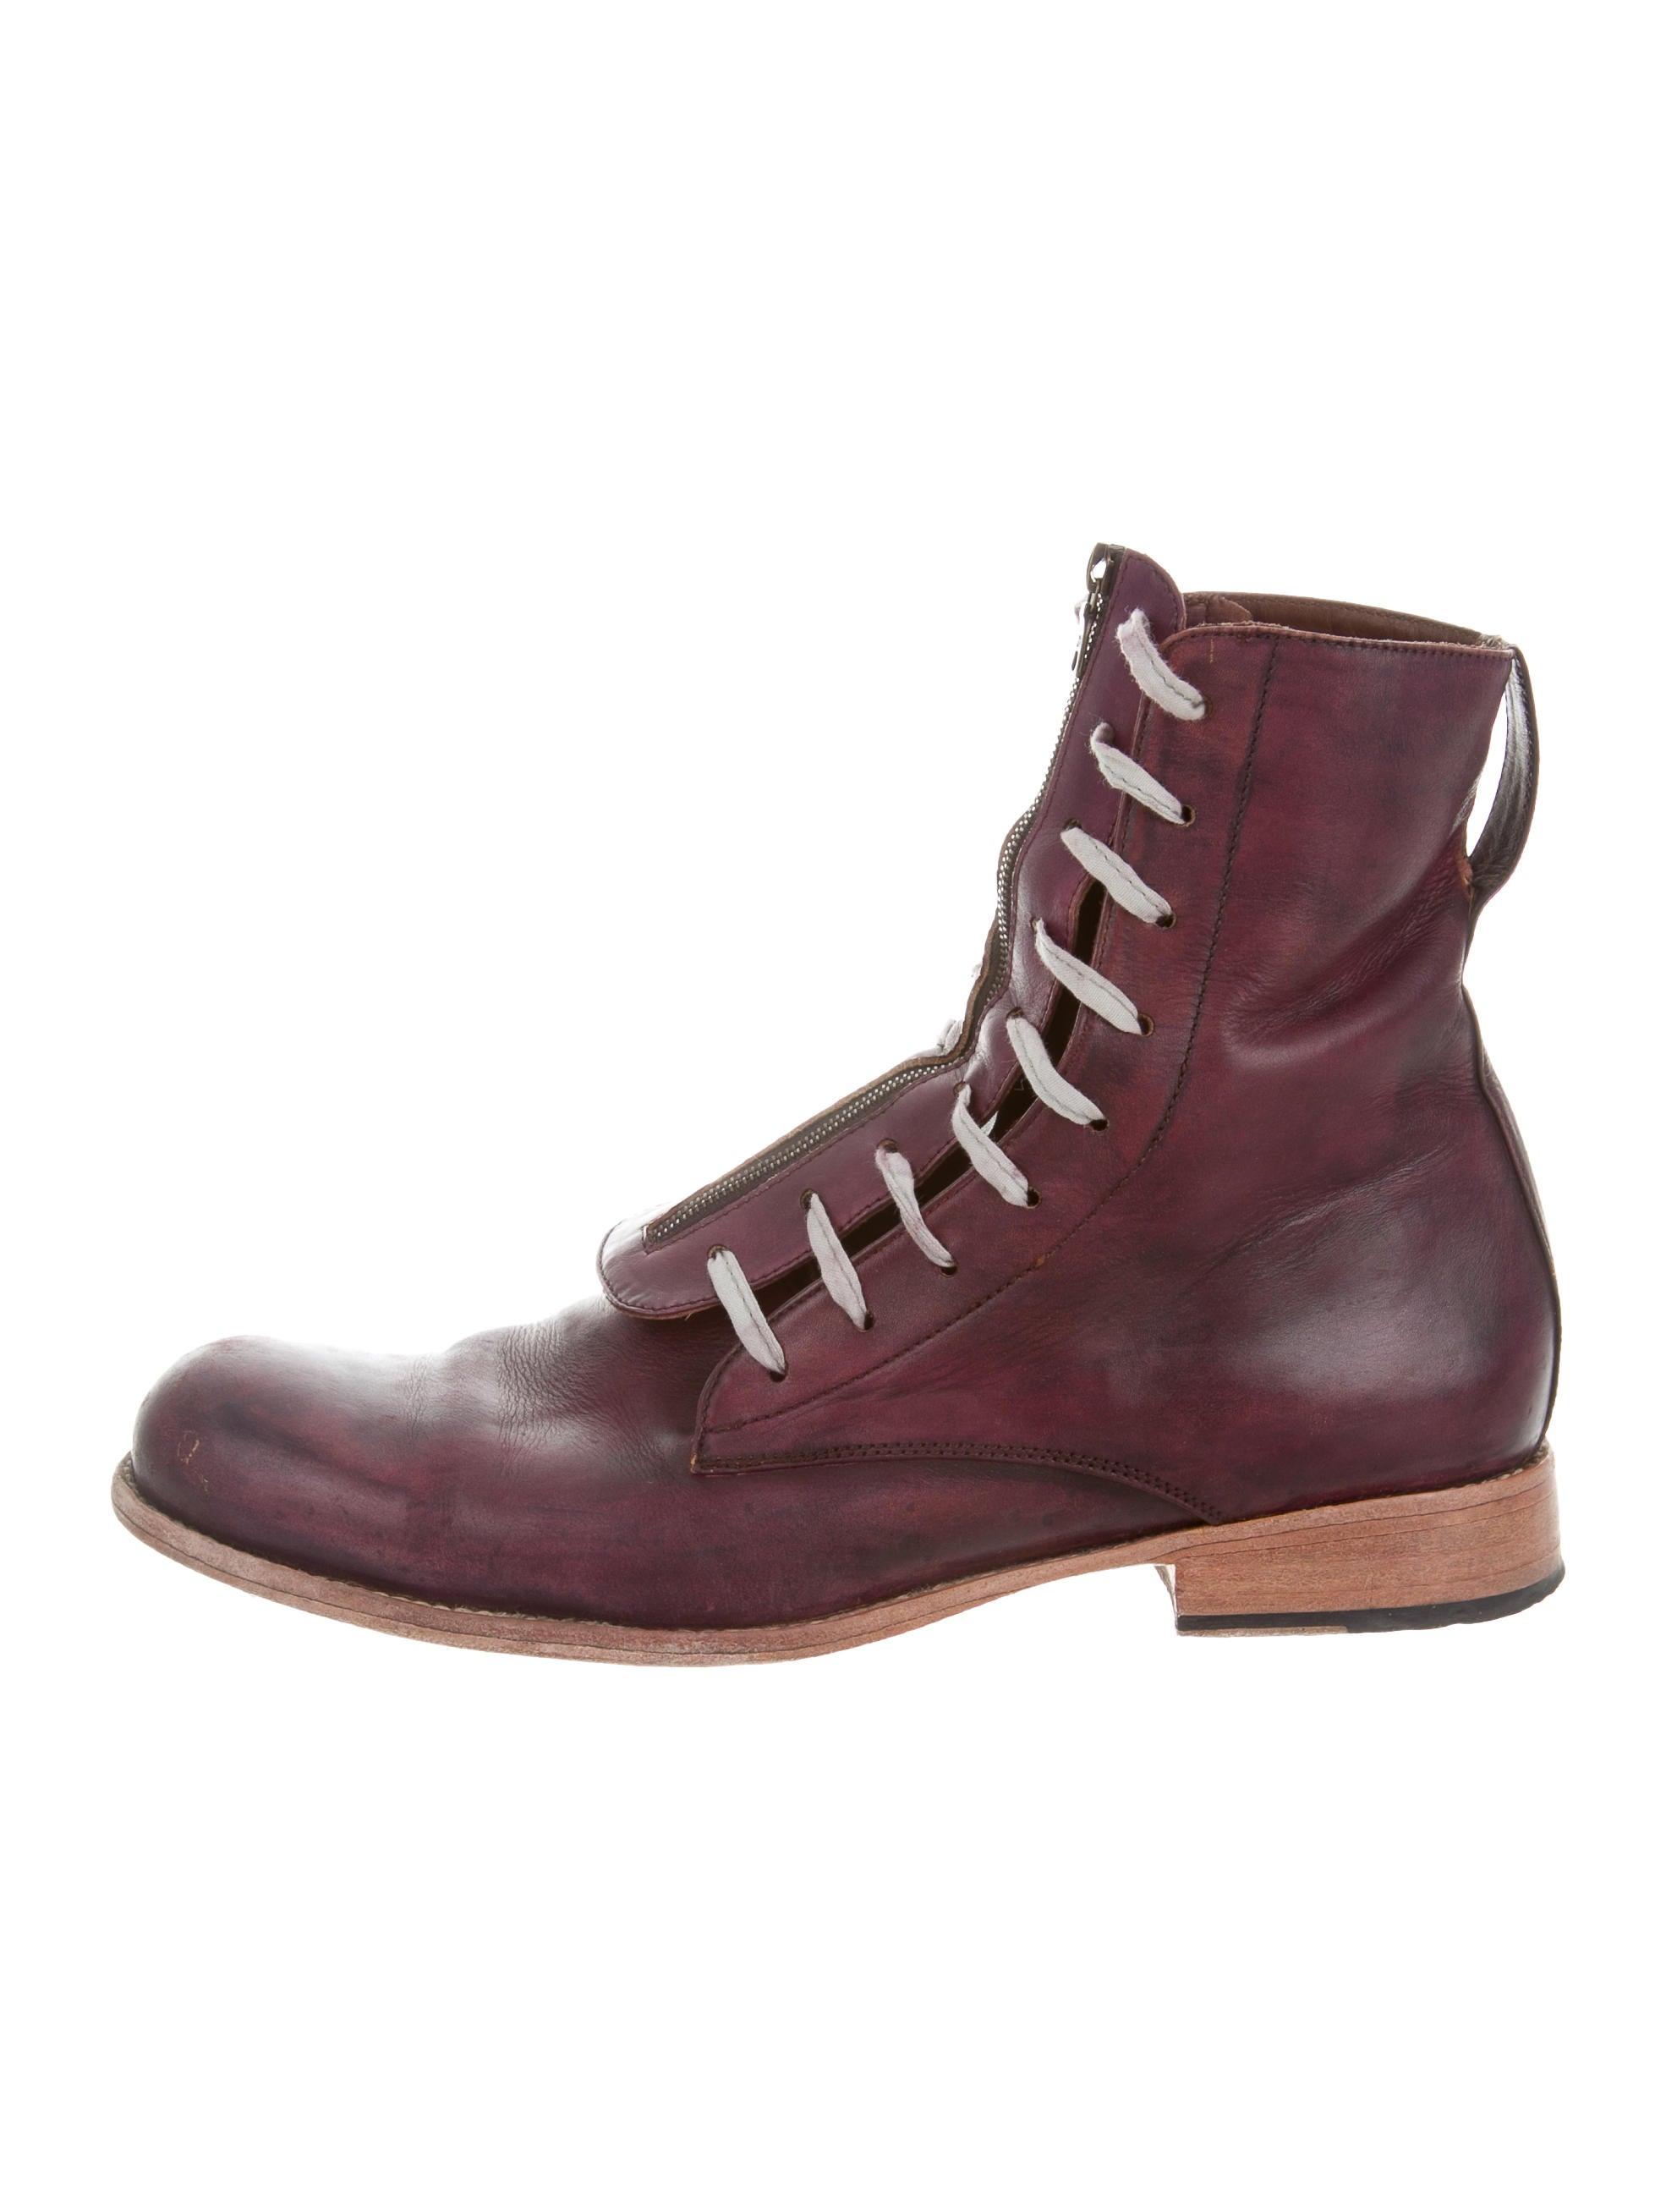 esquivel leather lace up ankle boots shoes esq20089